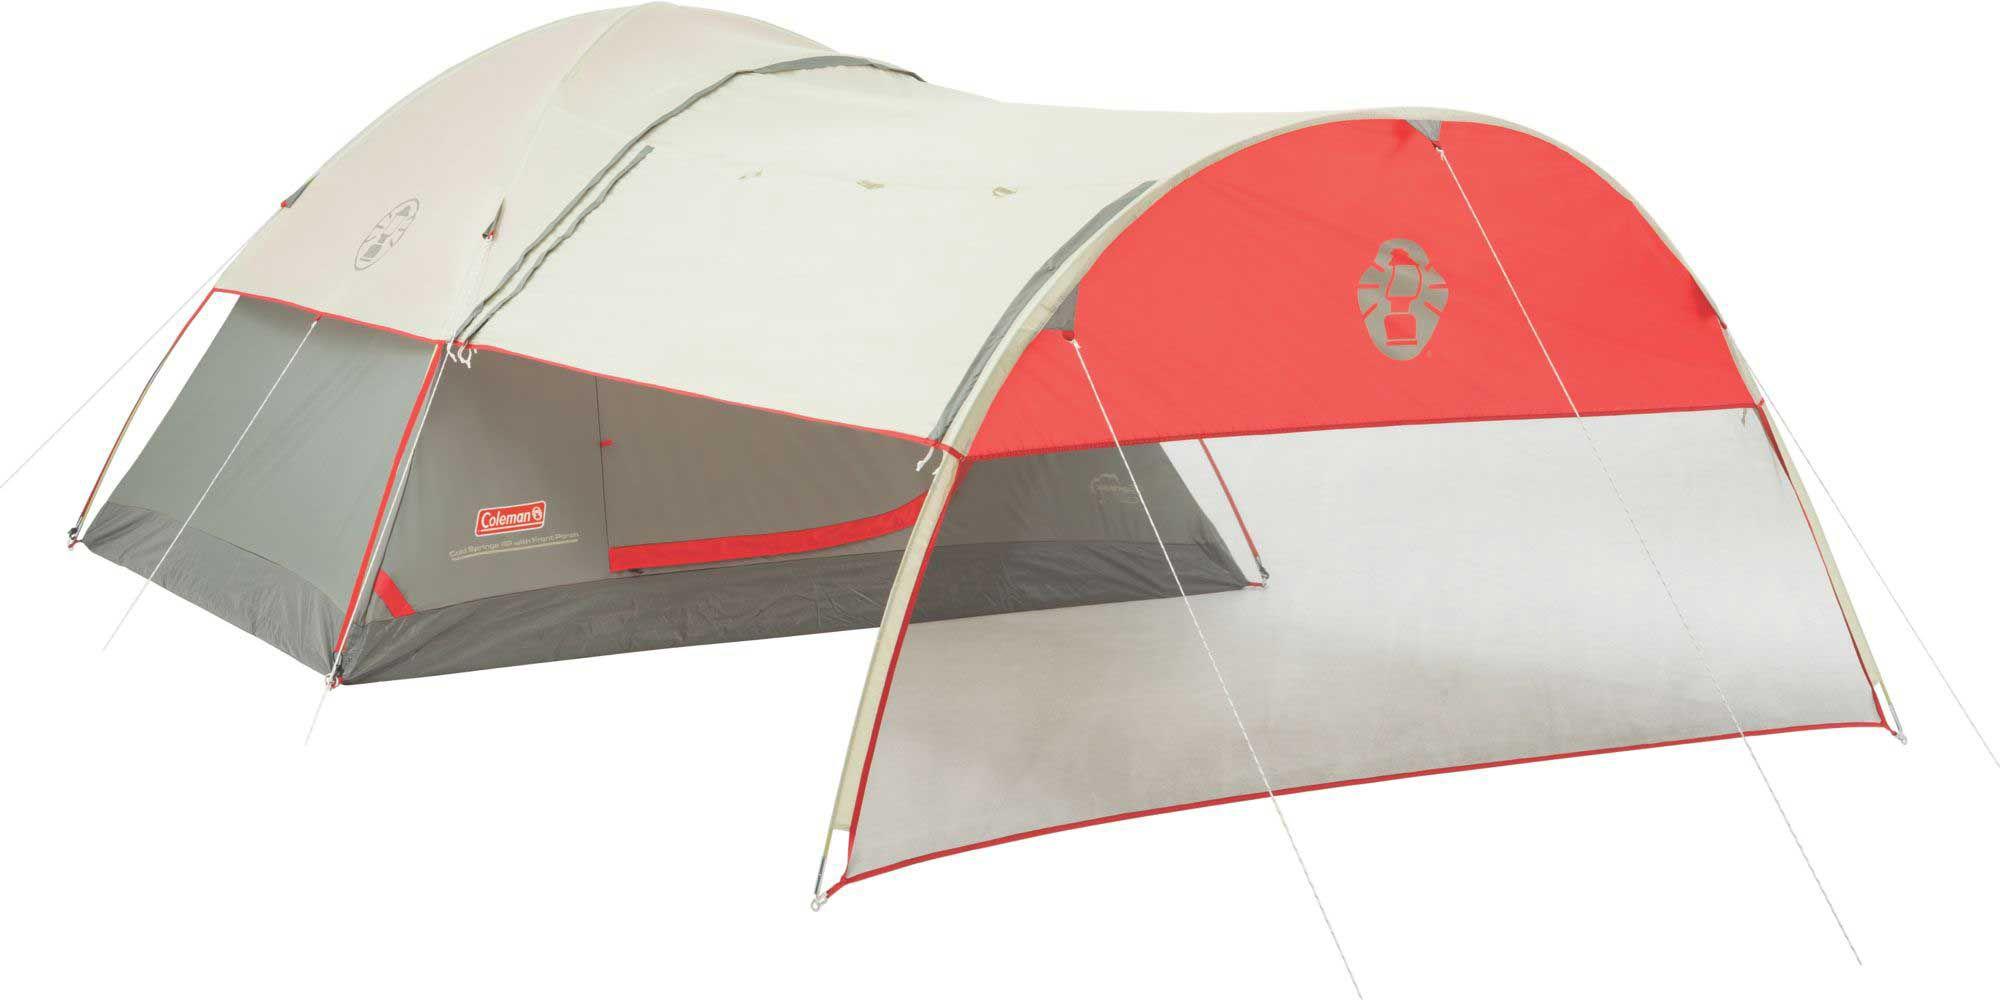 Coleman Sundome 4 Person Tent with Porch  sc 1 st  DICKu0027S Sporting Goods & Coleman Sundome 4 Person Tent with Porch   DICKu0027S Sporting Goods